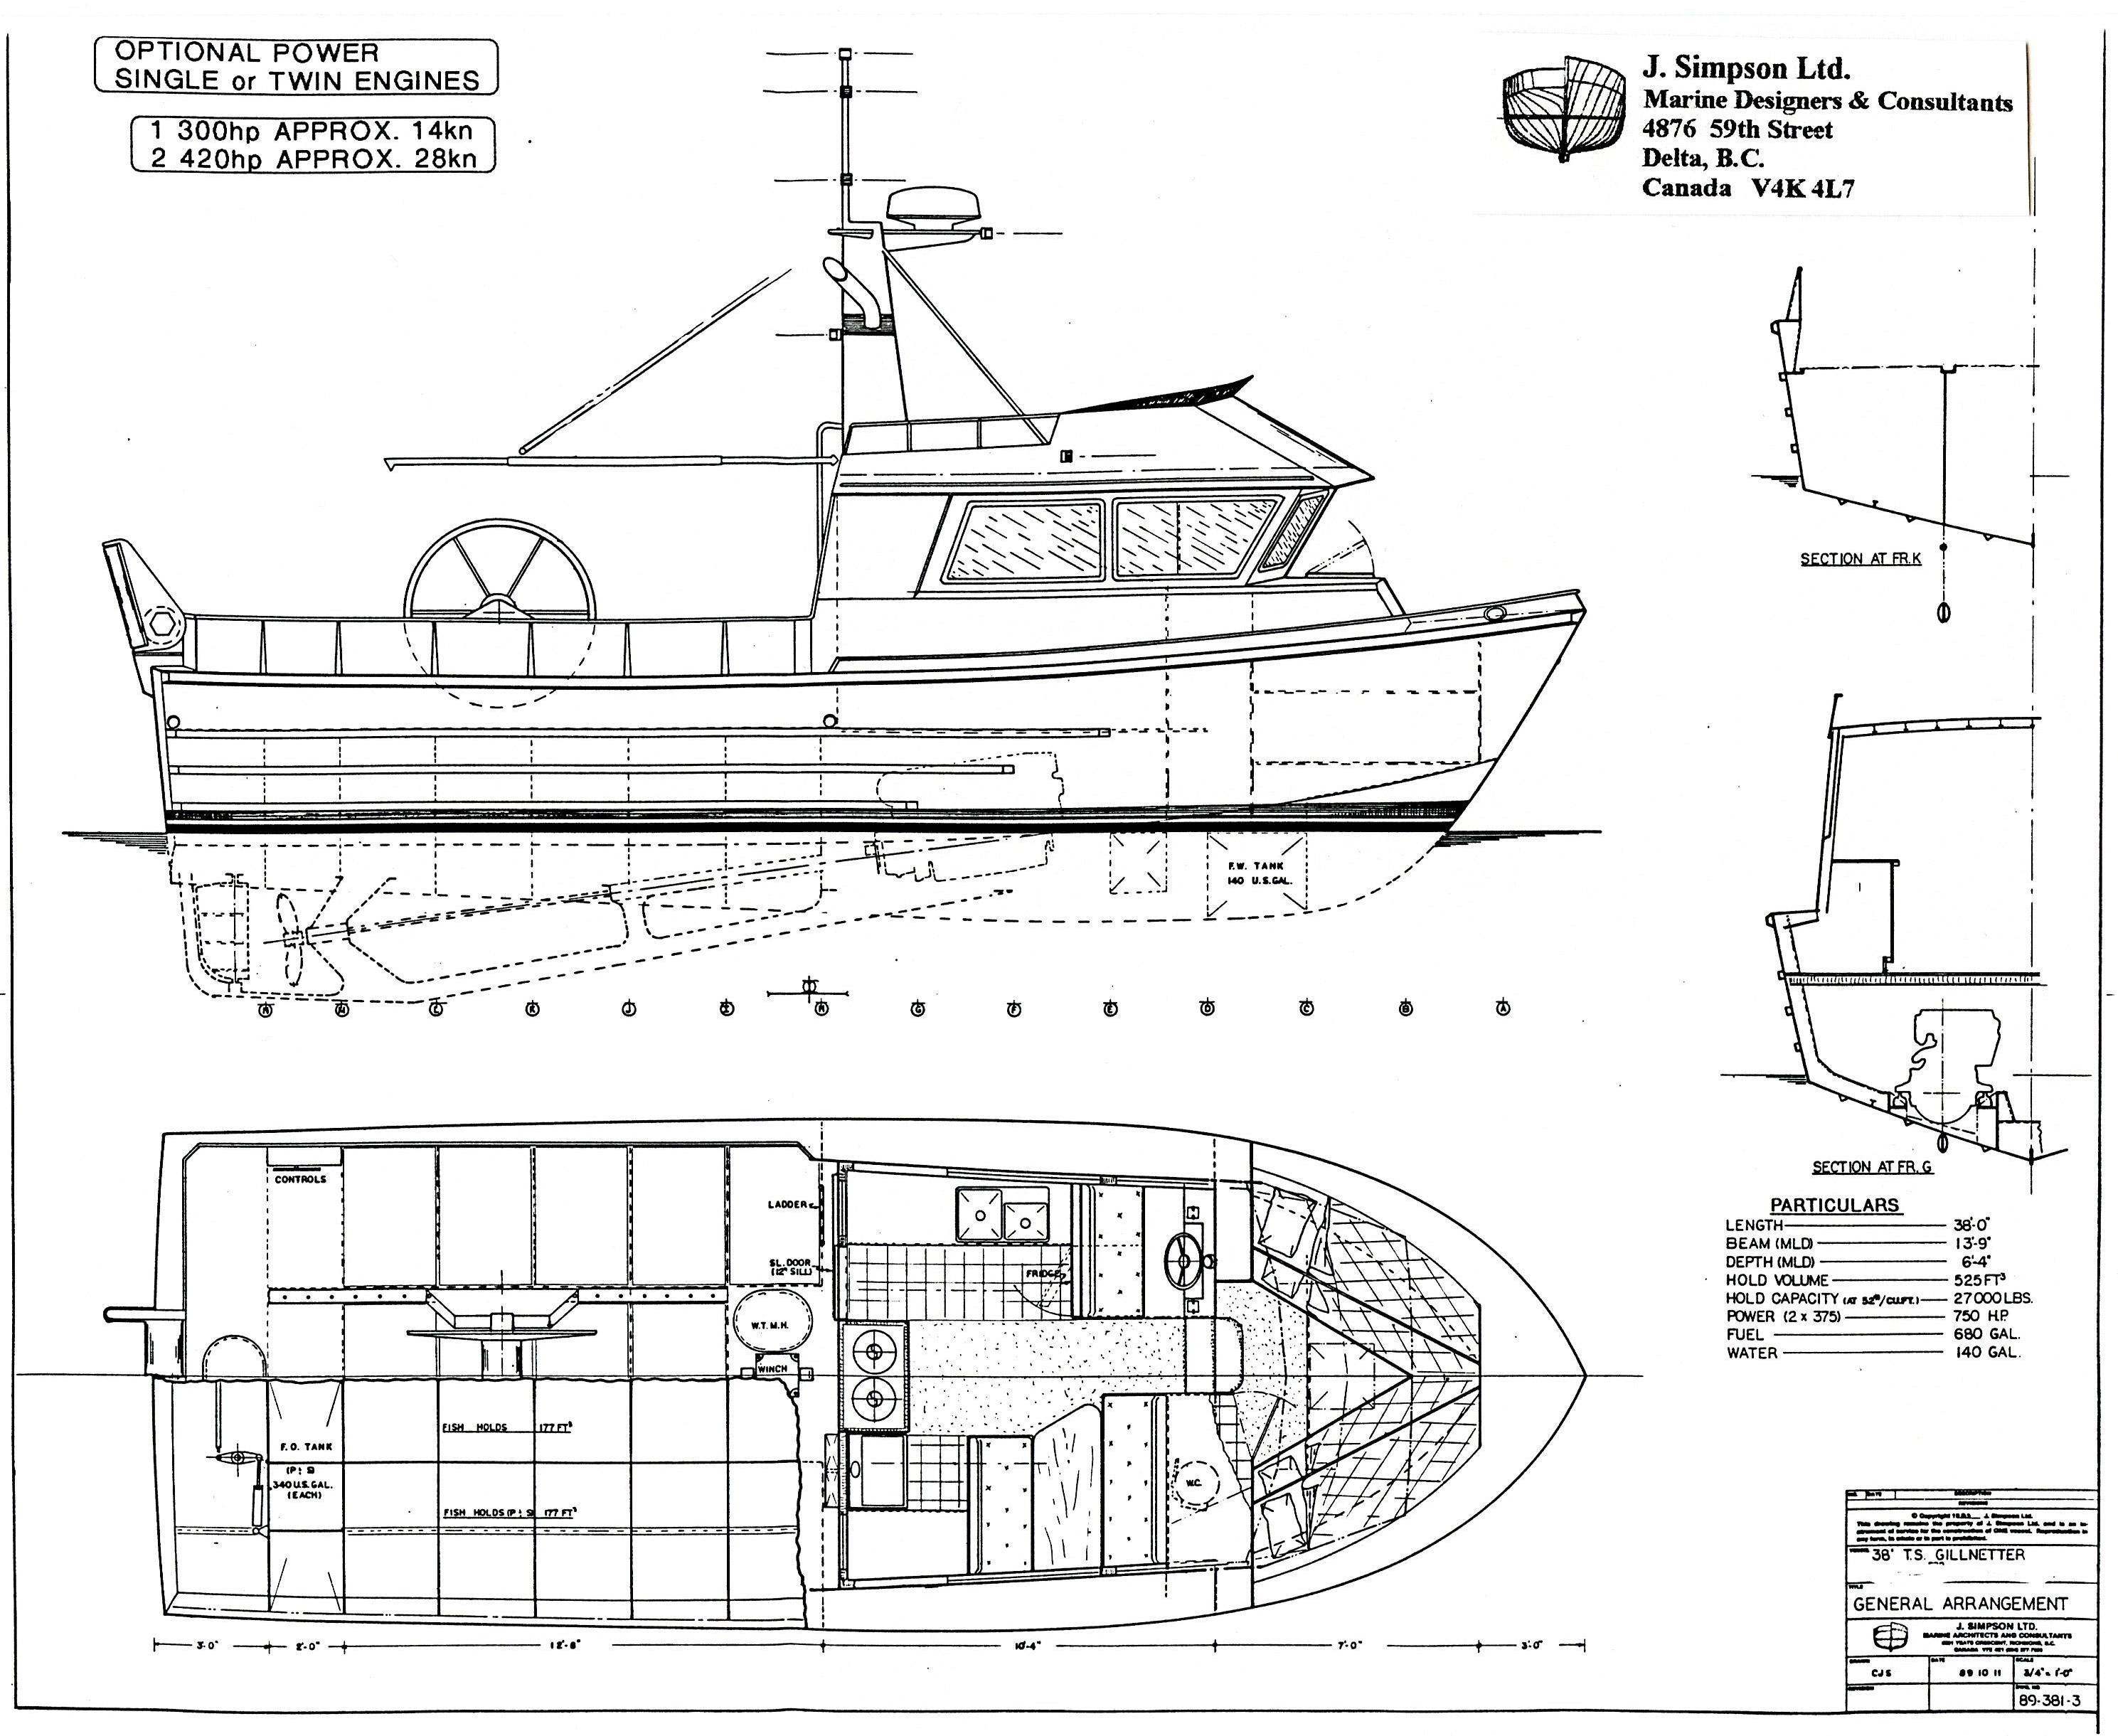 J. Simpson Ltd. Marine Designers and Consultants | 38ft Fishing Vessel